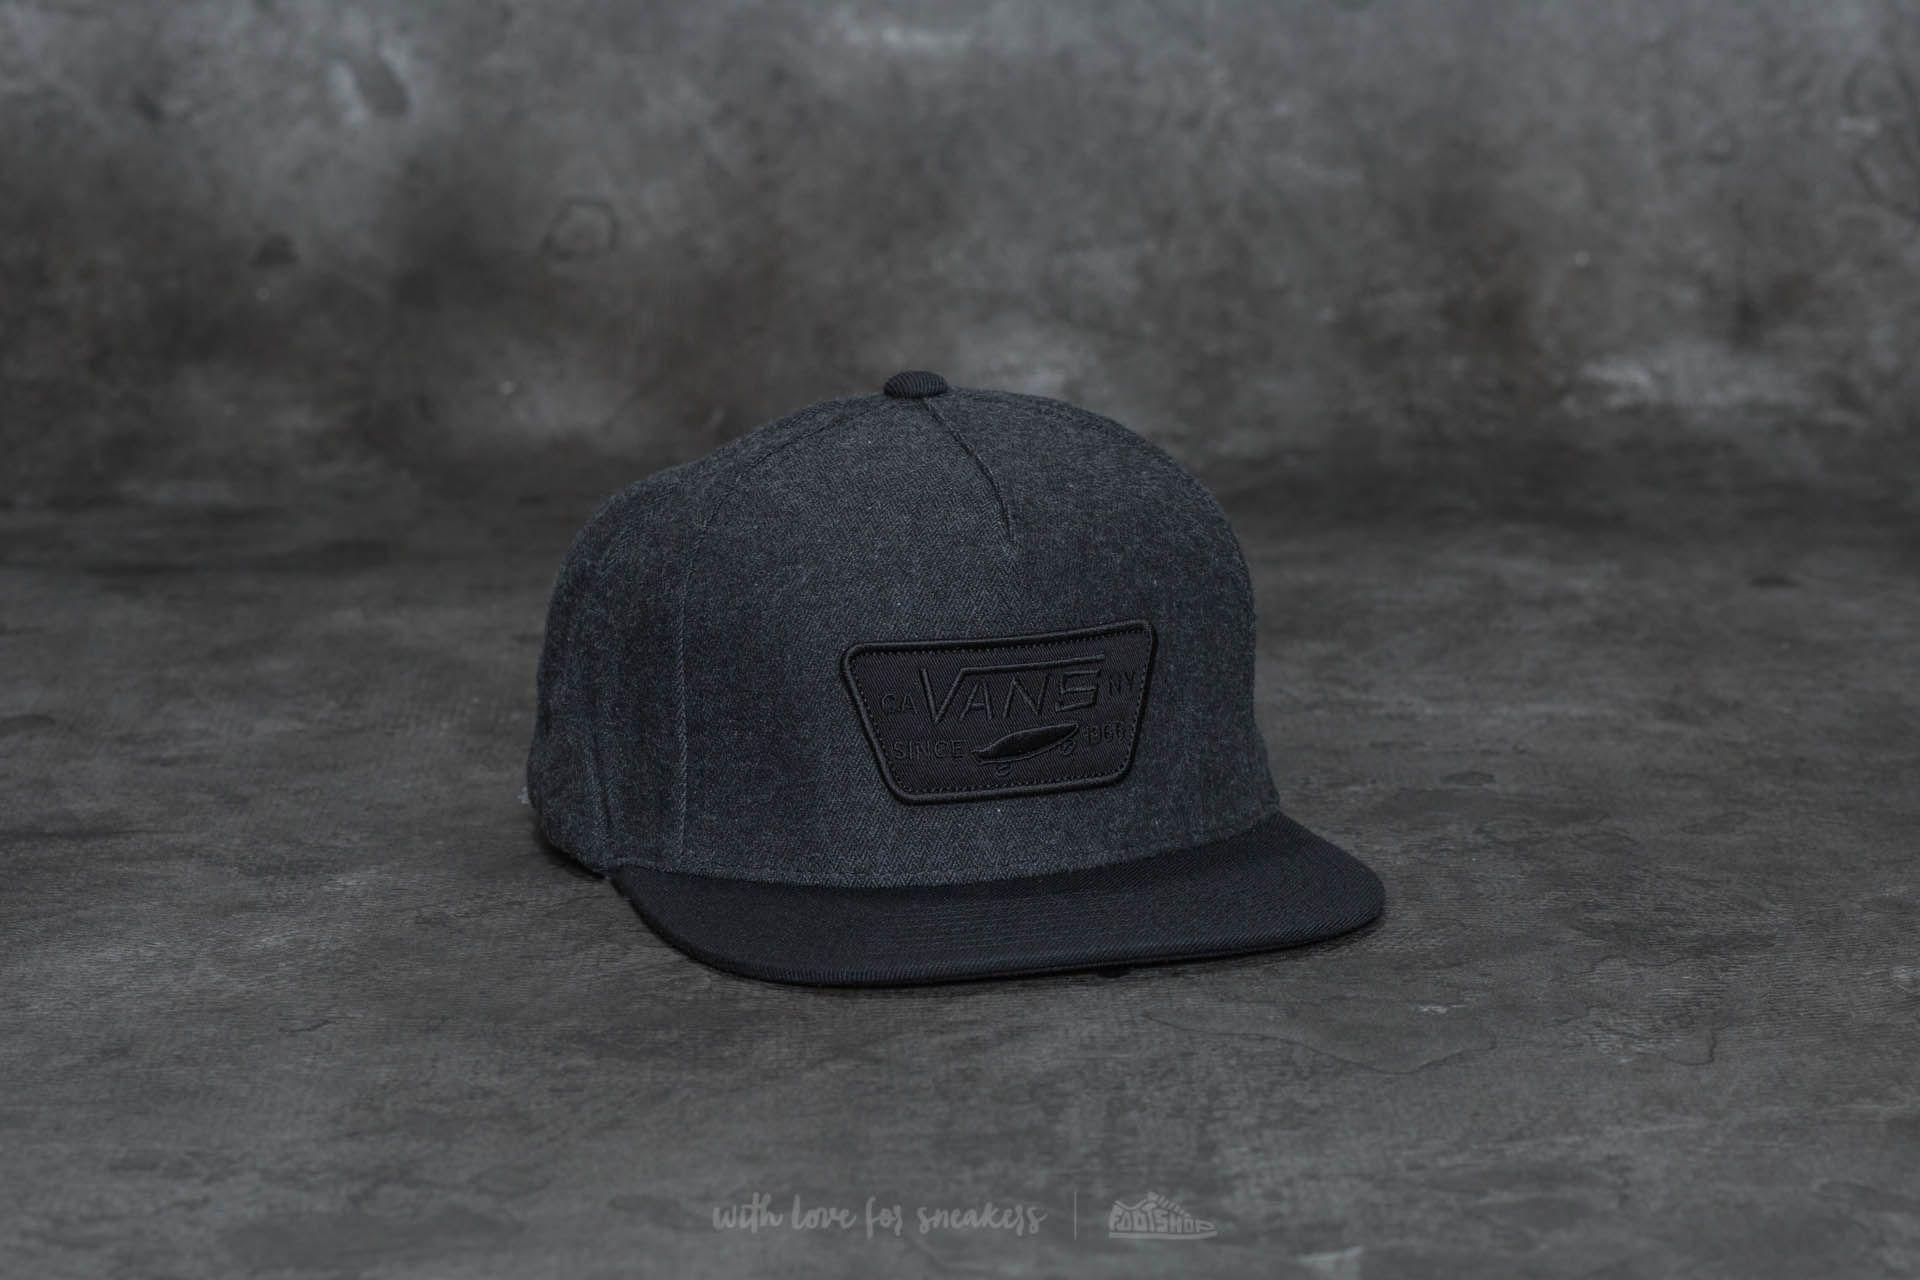 Vans Full Patch Snapback Asphalt-Black  6ff78de2a78